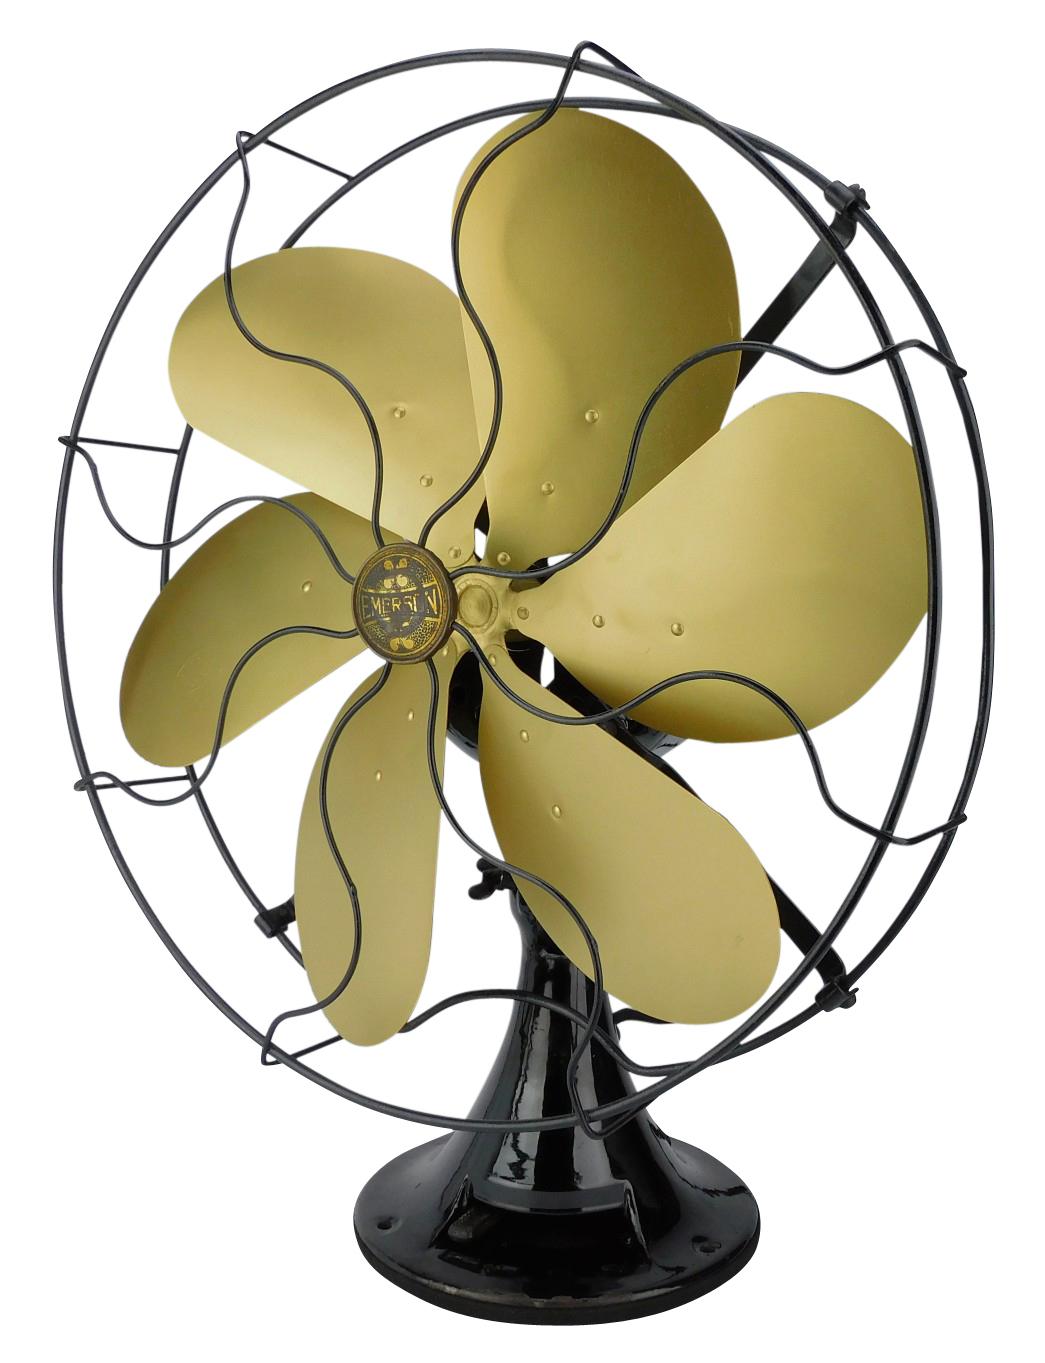 "Circa 1929 Emerson 16"" 6 Blade Oscillating Desk Fan"